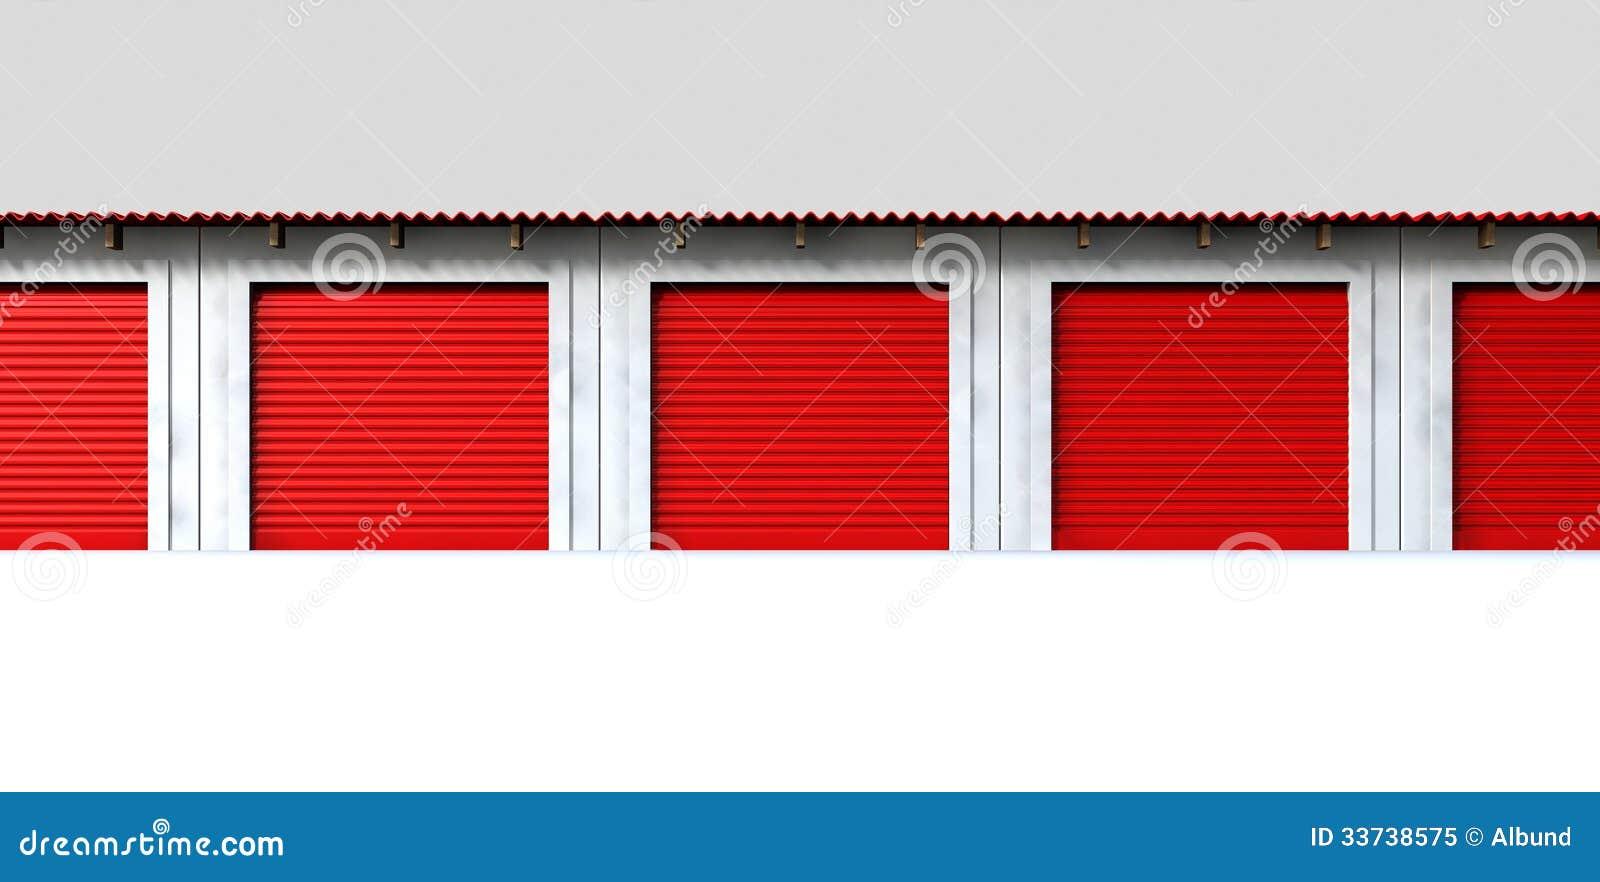 Storage Lockers Front Stock Illustration. Illustration Of Mini   33738575